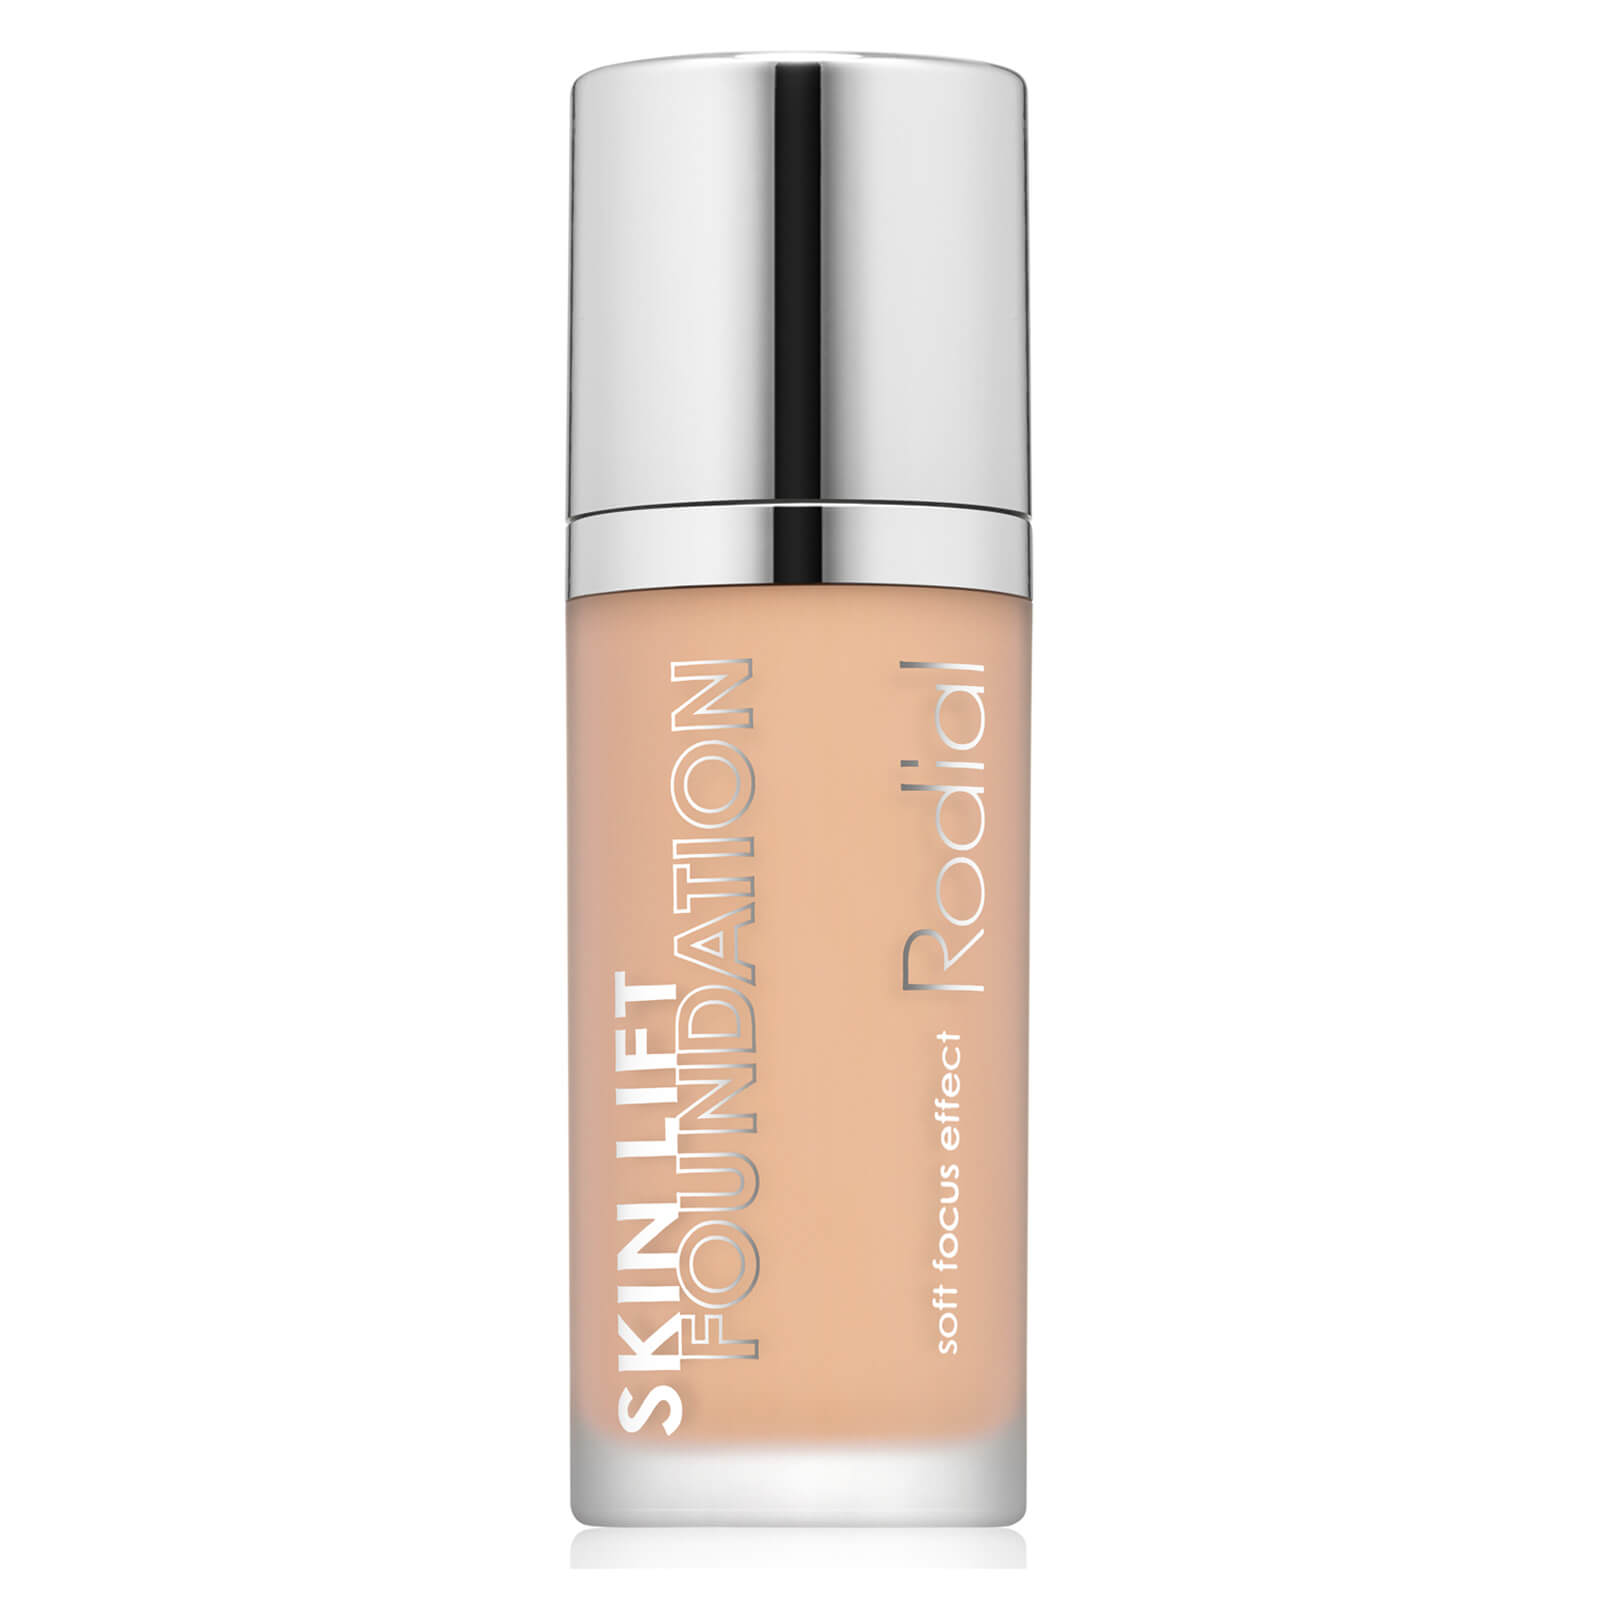 Rodial Skin Lift Foundation 25ml (Various Shades) - 2 Alabaster Crème